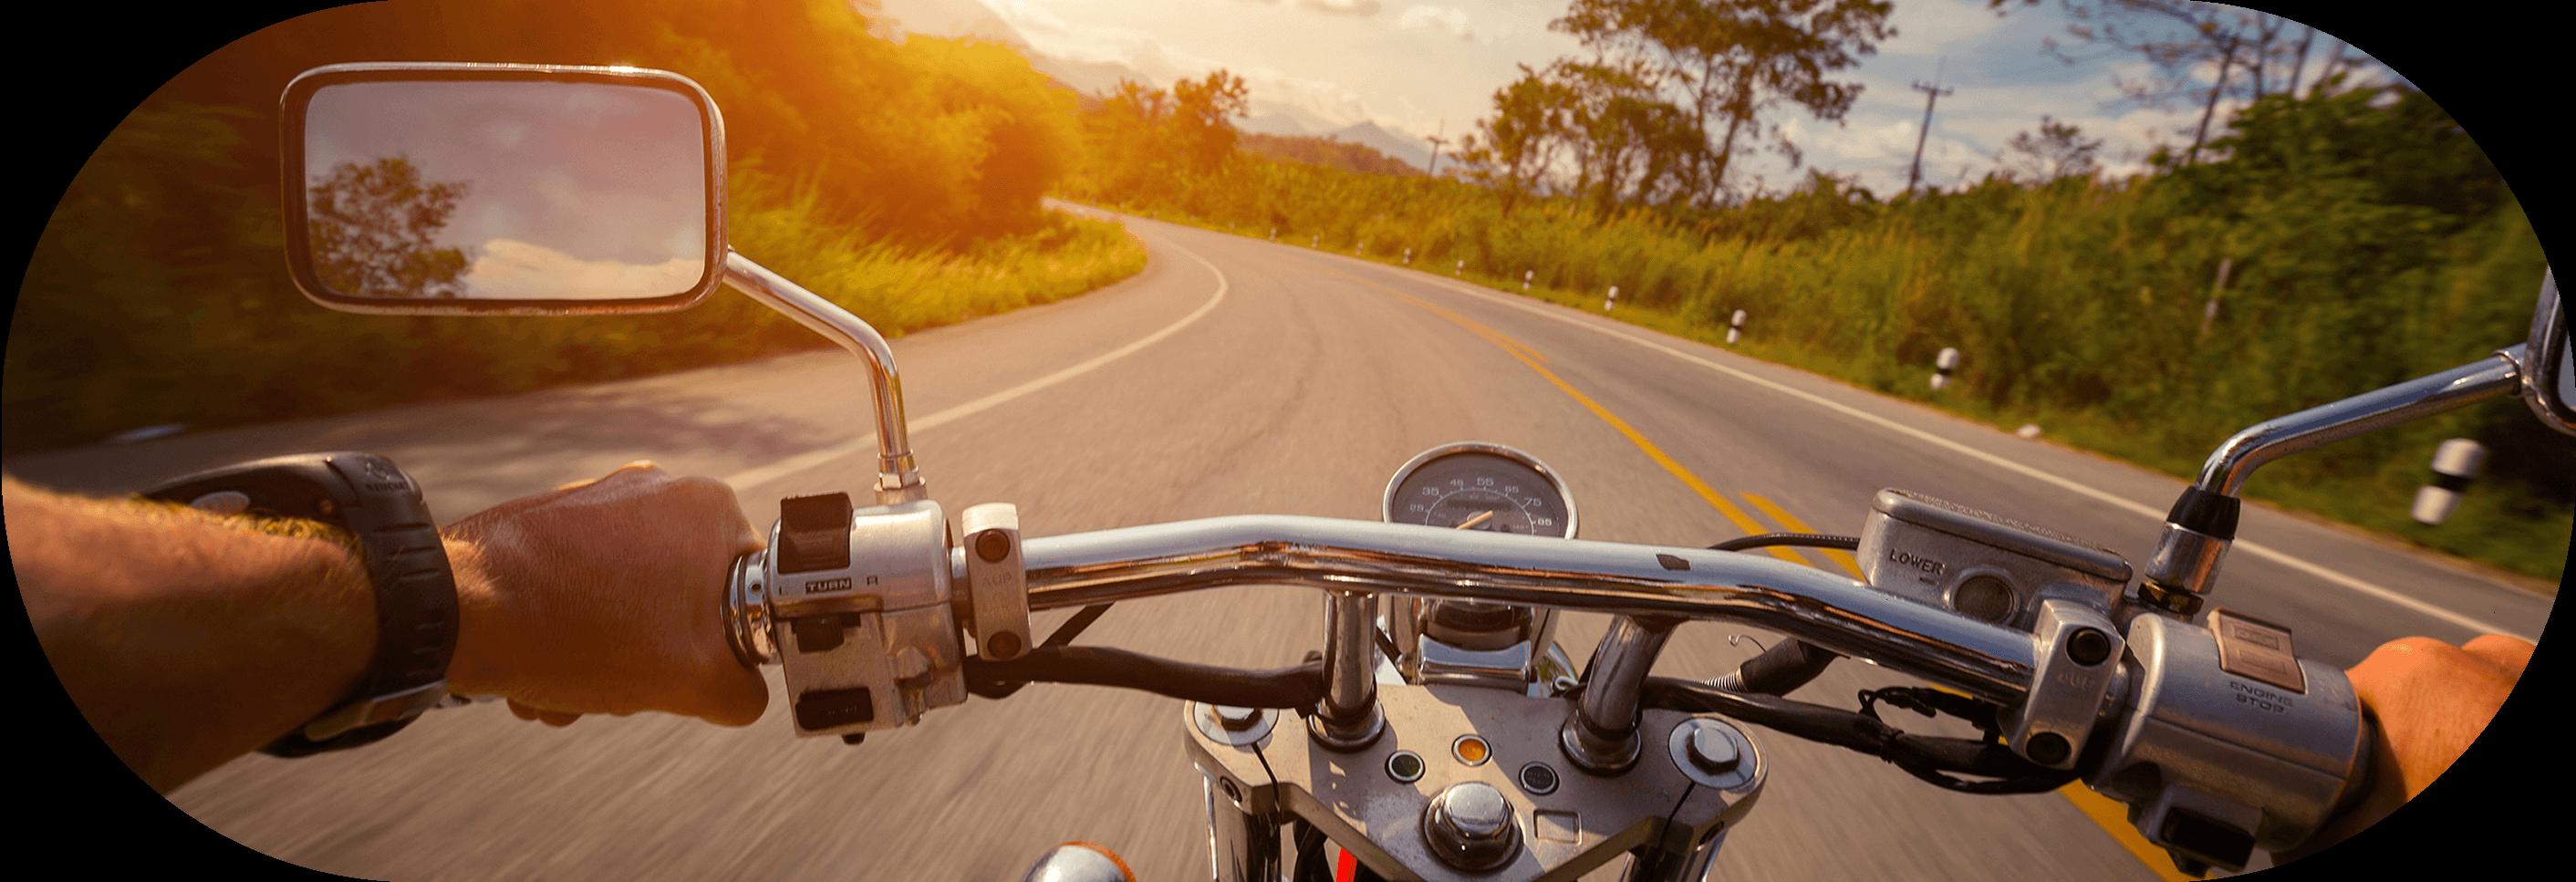 Motorcycle Loan - CBI Federal Credit Union